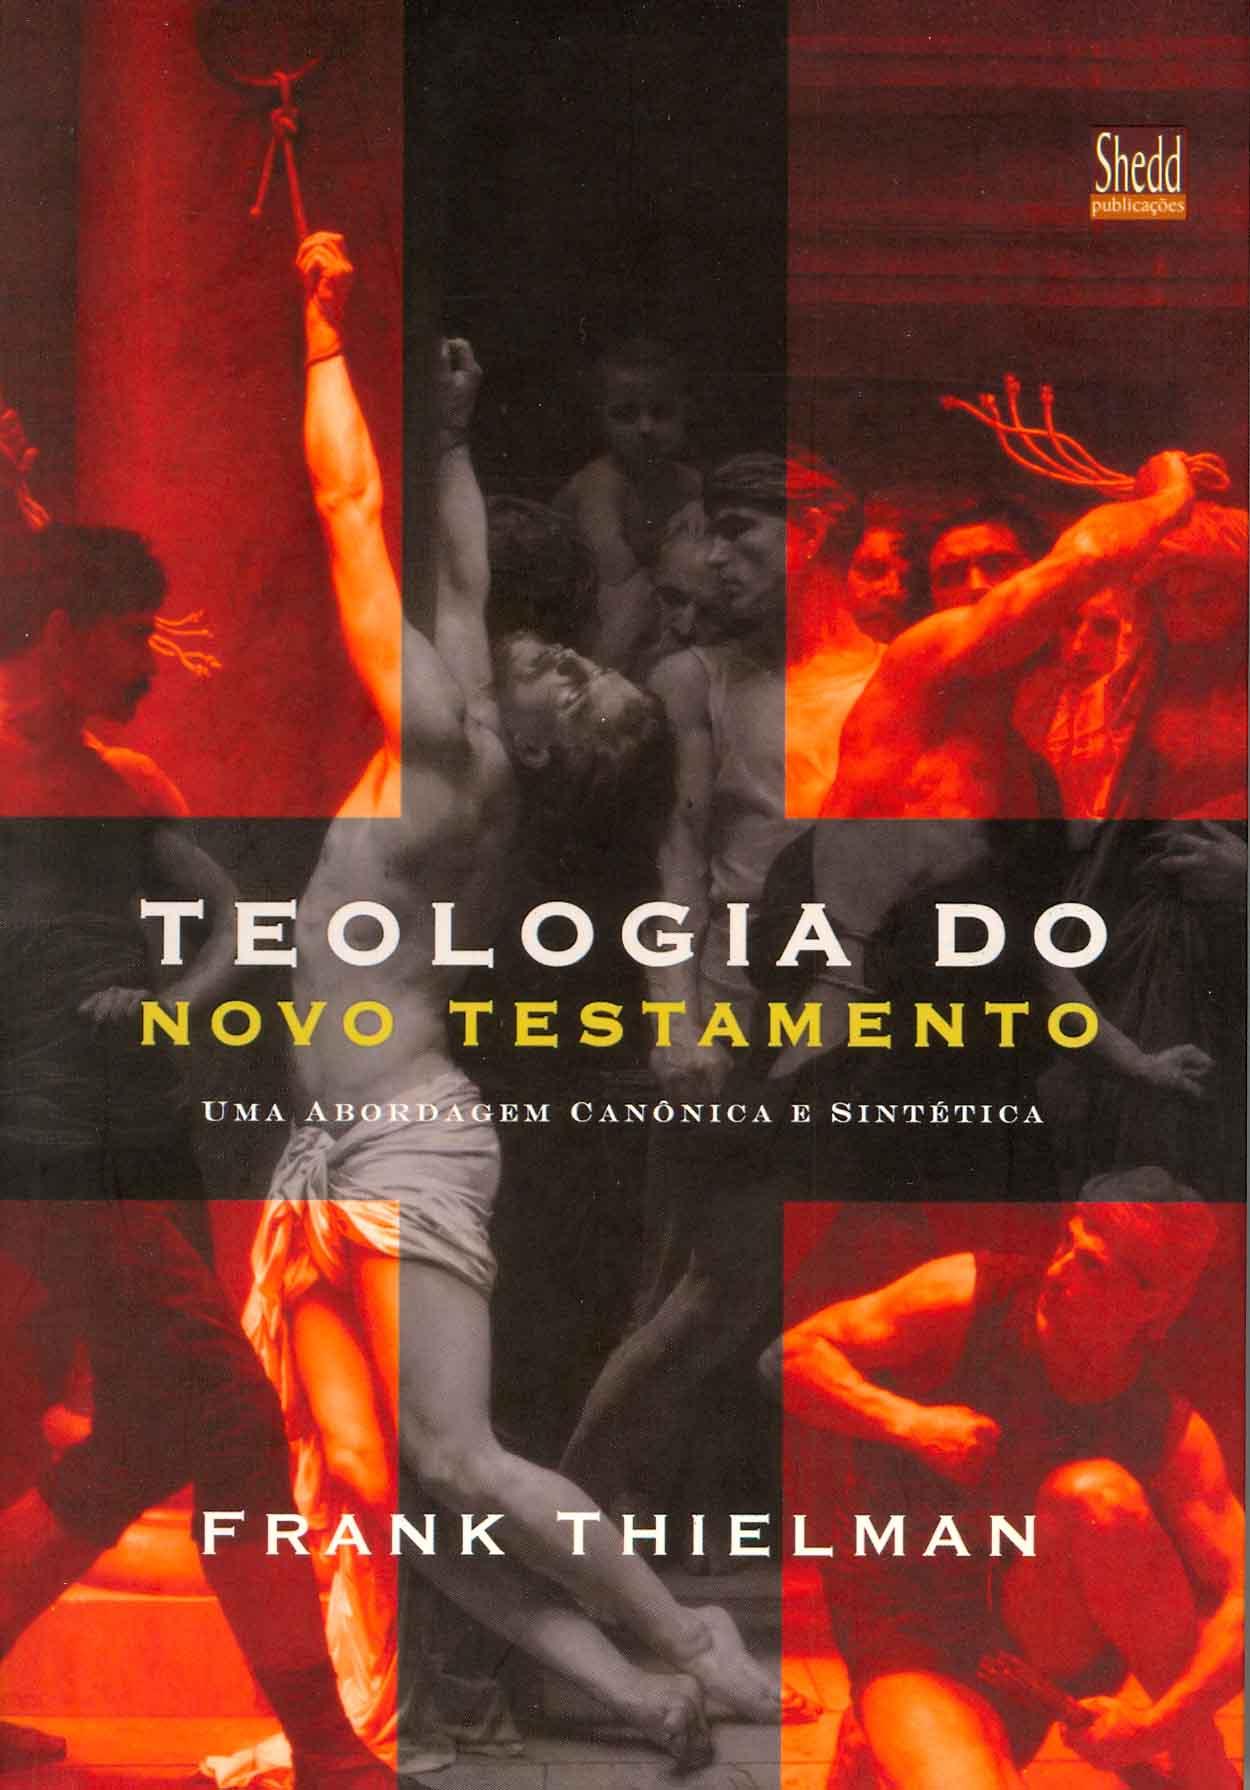 Teologia do Novo Testamento - F. Thielman